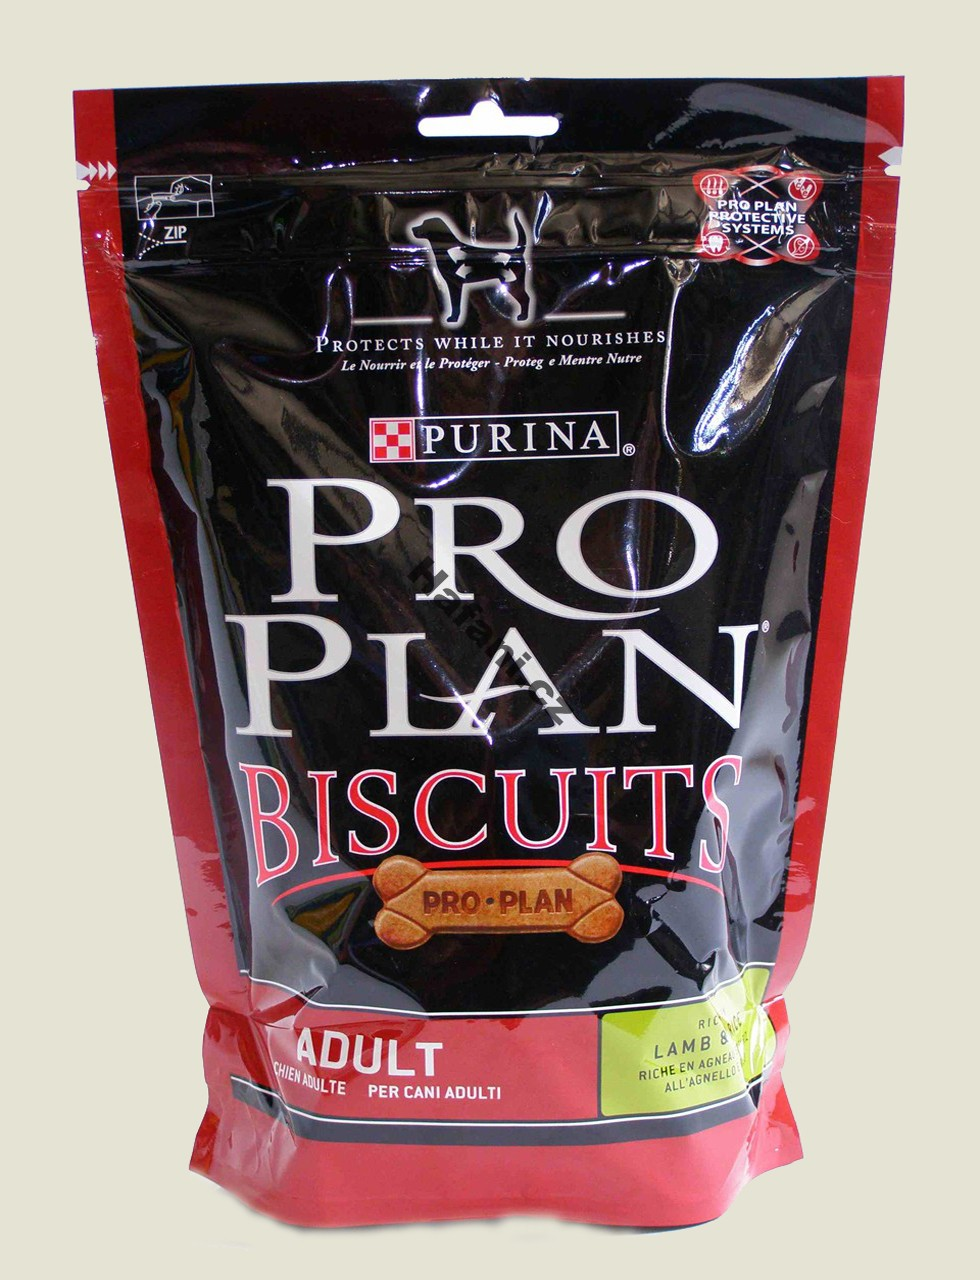 Pochoutka pro psy - Purina Biscuits Lamb&Rice pes 400g